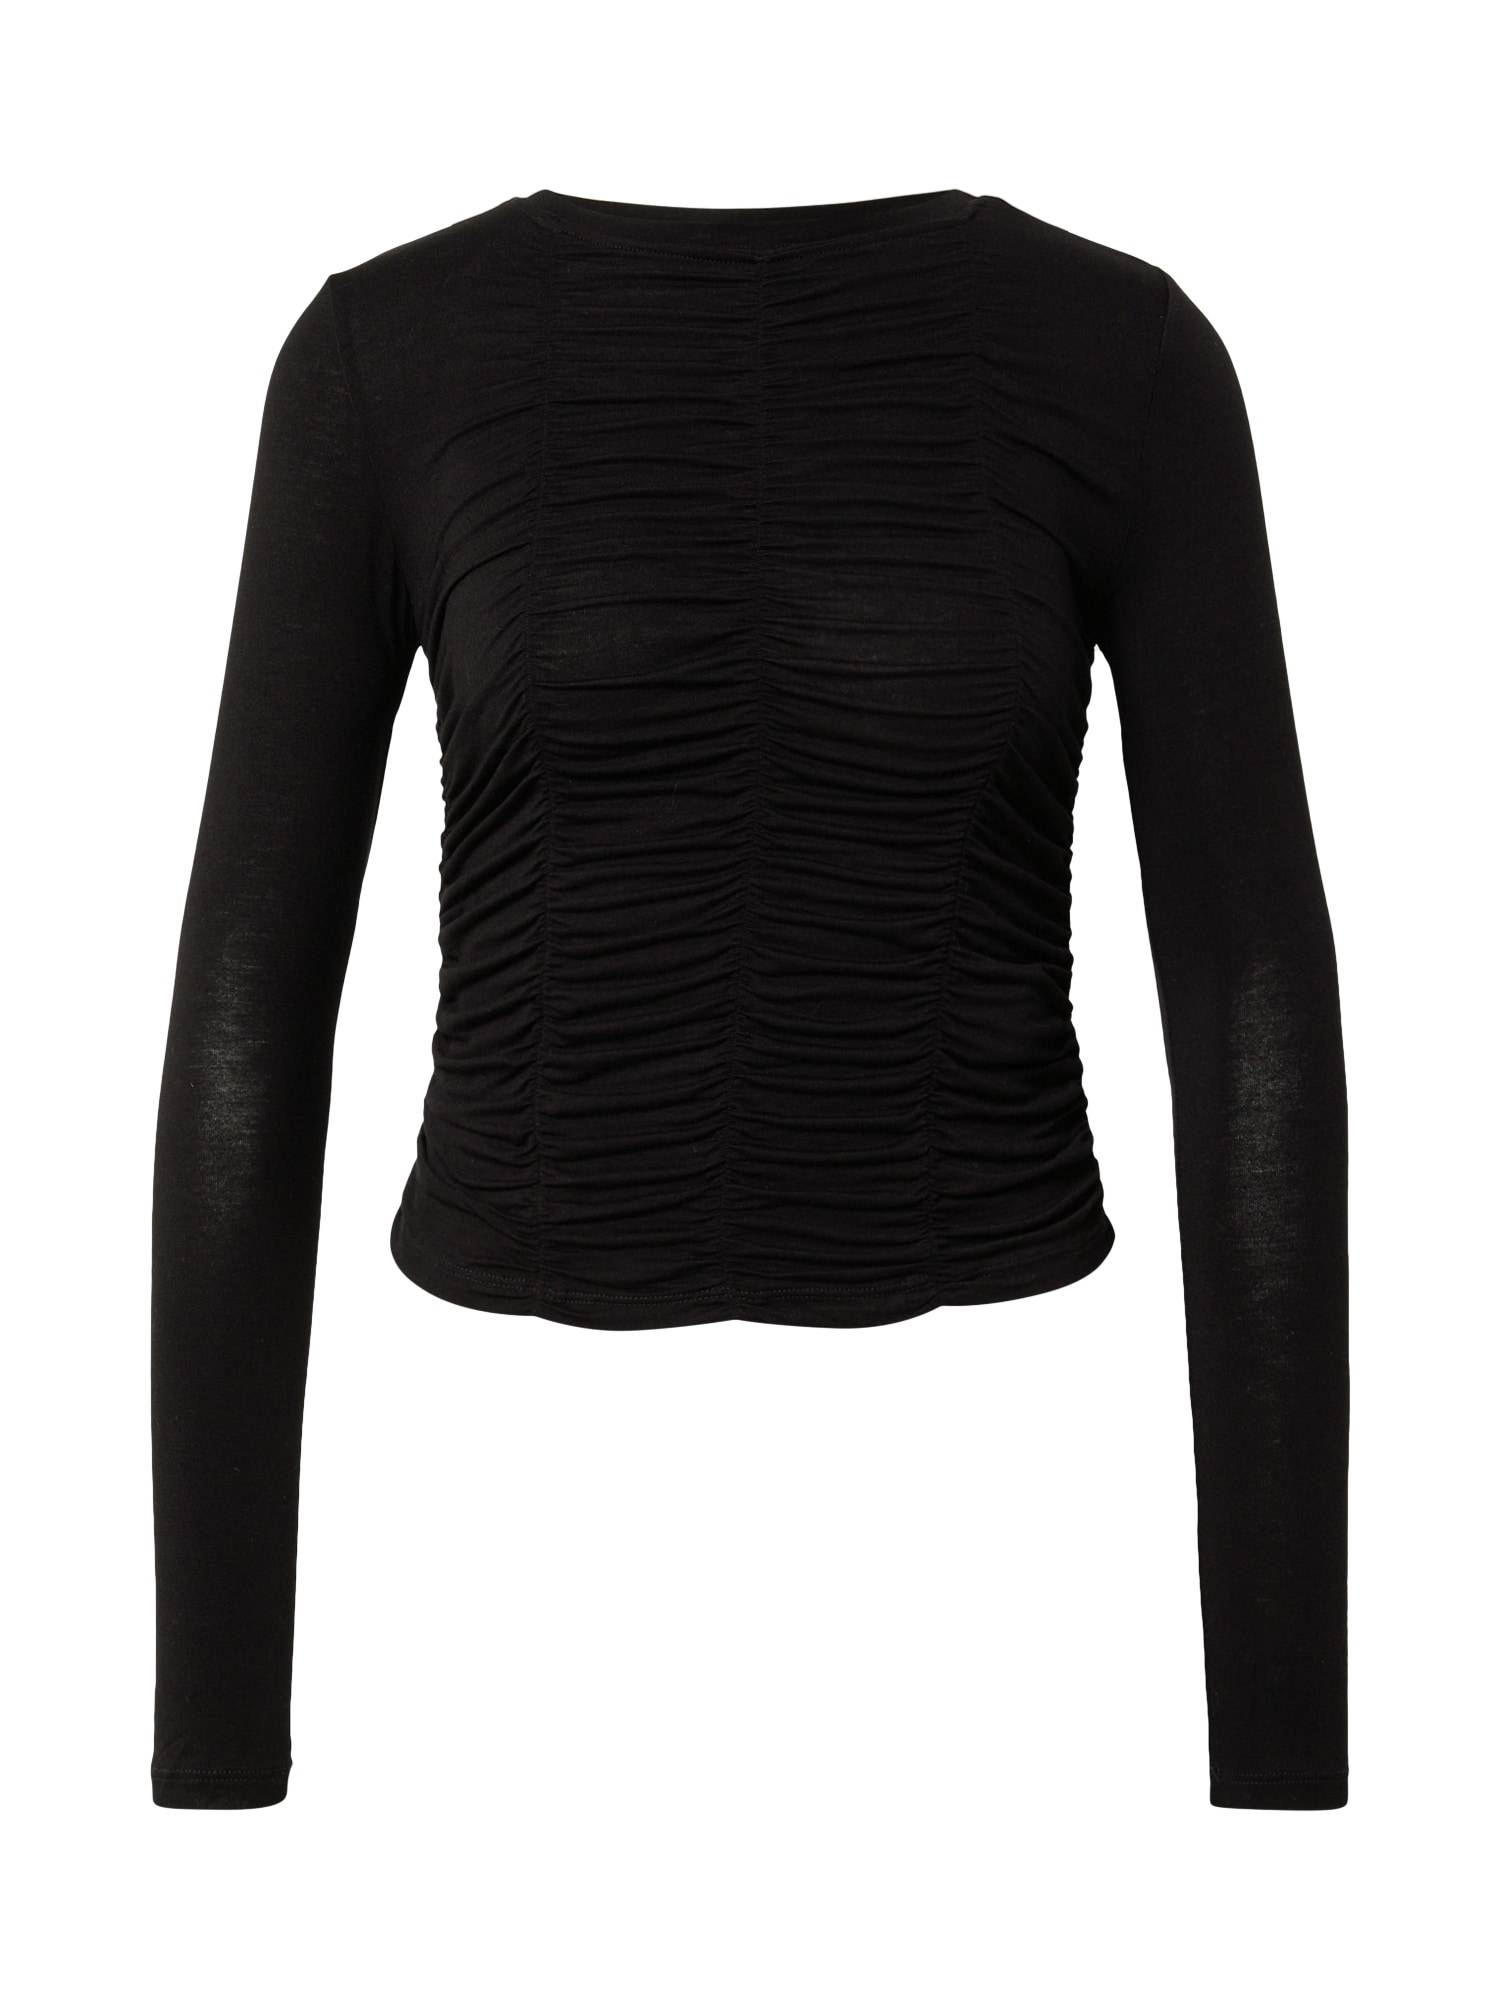 Gina Tricot Haut 'Catti'  - Noir - Taille: M - female